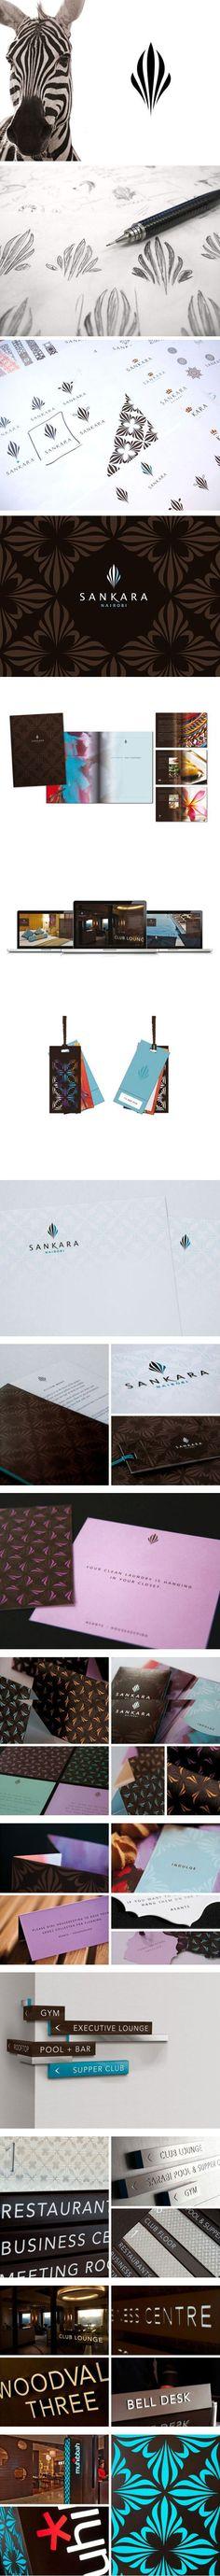 Sankara Hotel / Branding / Identity / Logo / Process / sketch / inspiration / zebra / stripes / pattern / stationery / business card / signs